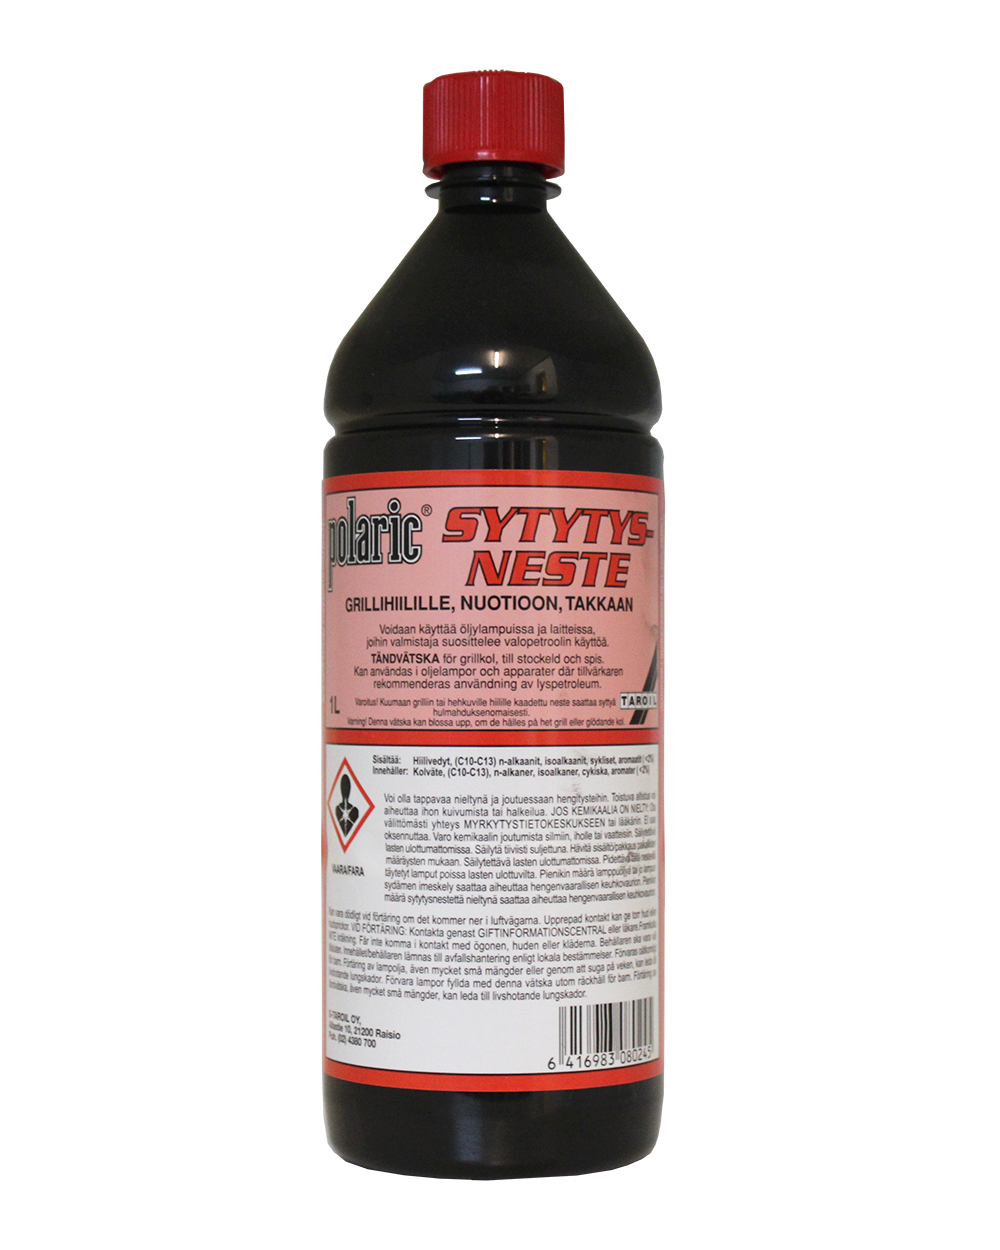 Polaric Sytytysneste 1 L